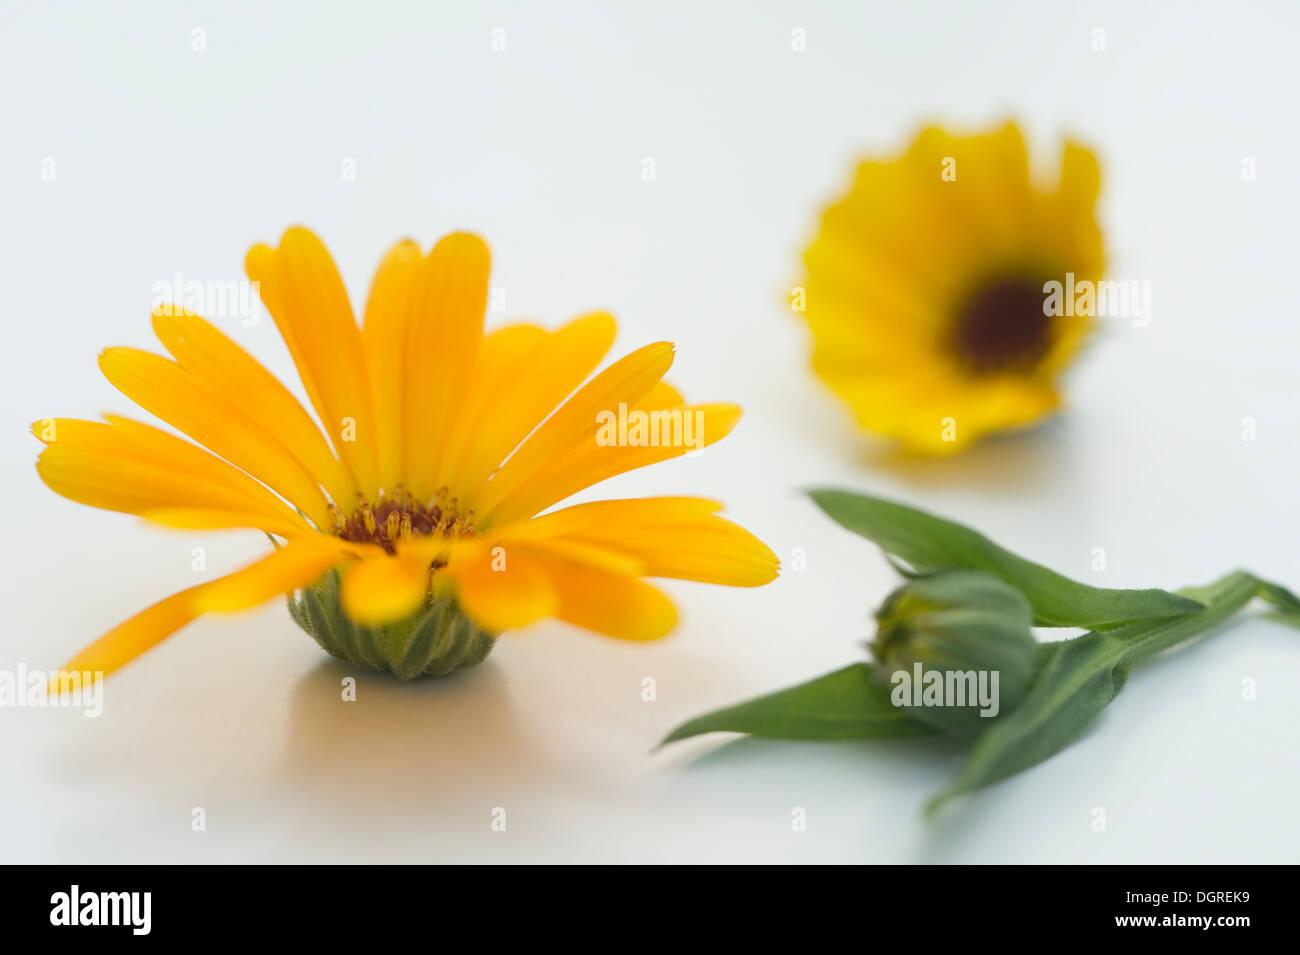 Pot Marigold (Calendula officinalis), medical plant, studio shot - Stock Image